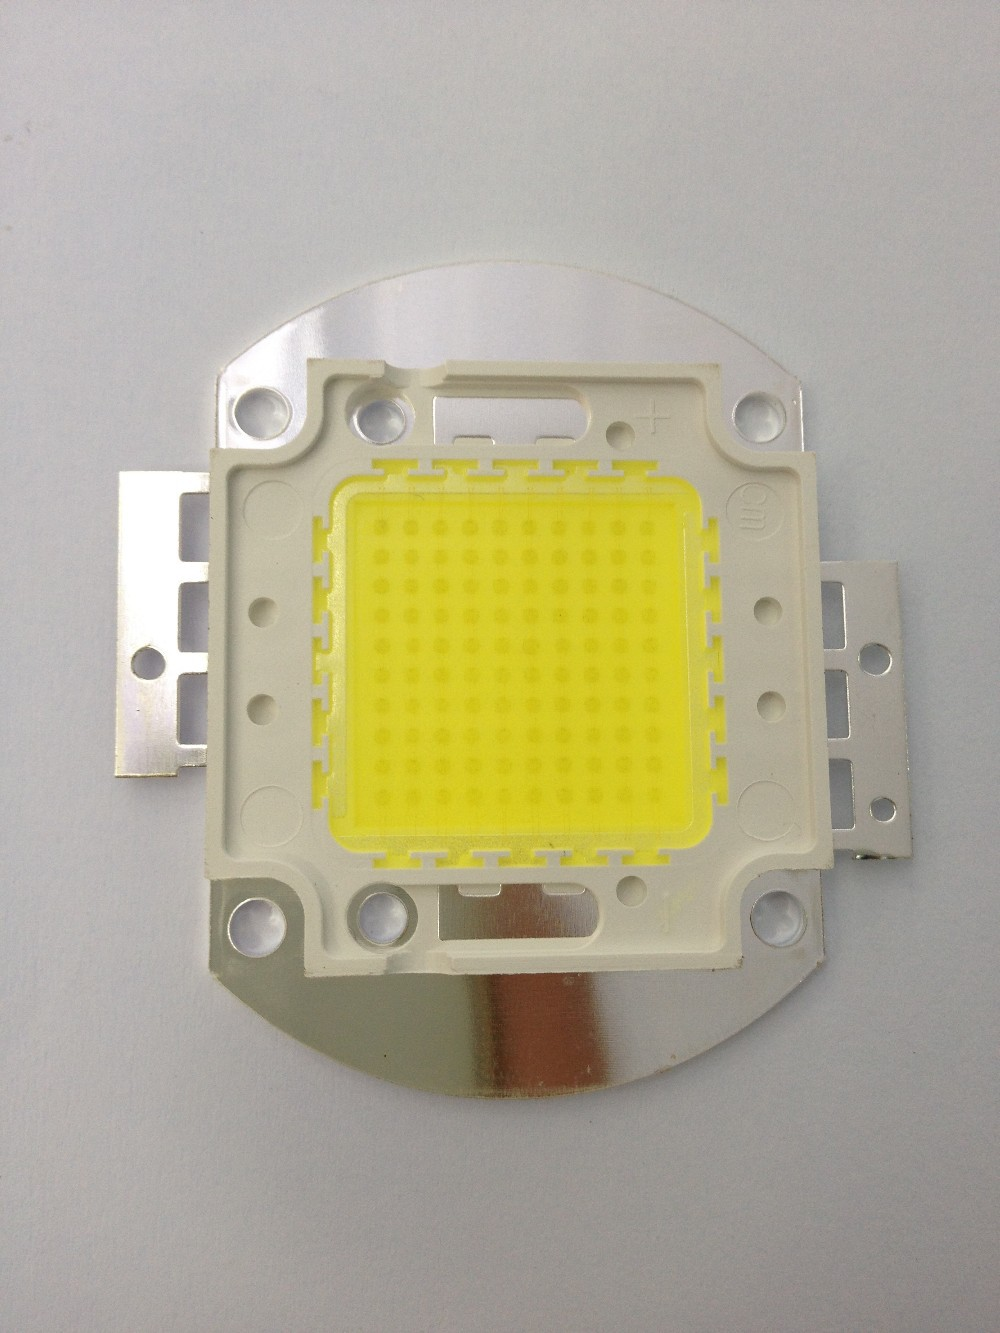 100W led light source module Epistar 33*33mil 10P10S 110-120LM high power led floodlight bulb tube input DC30-36V 3000ma